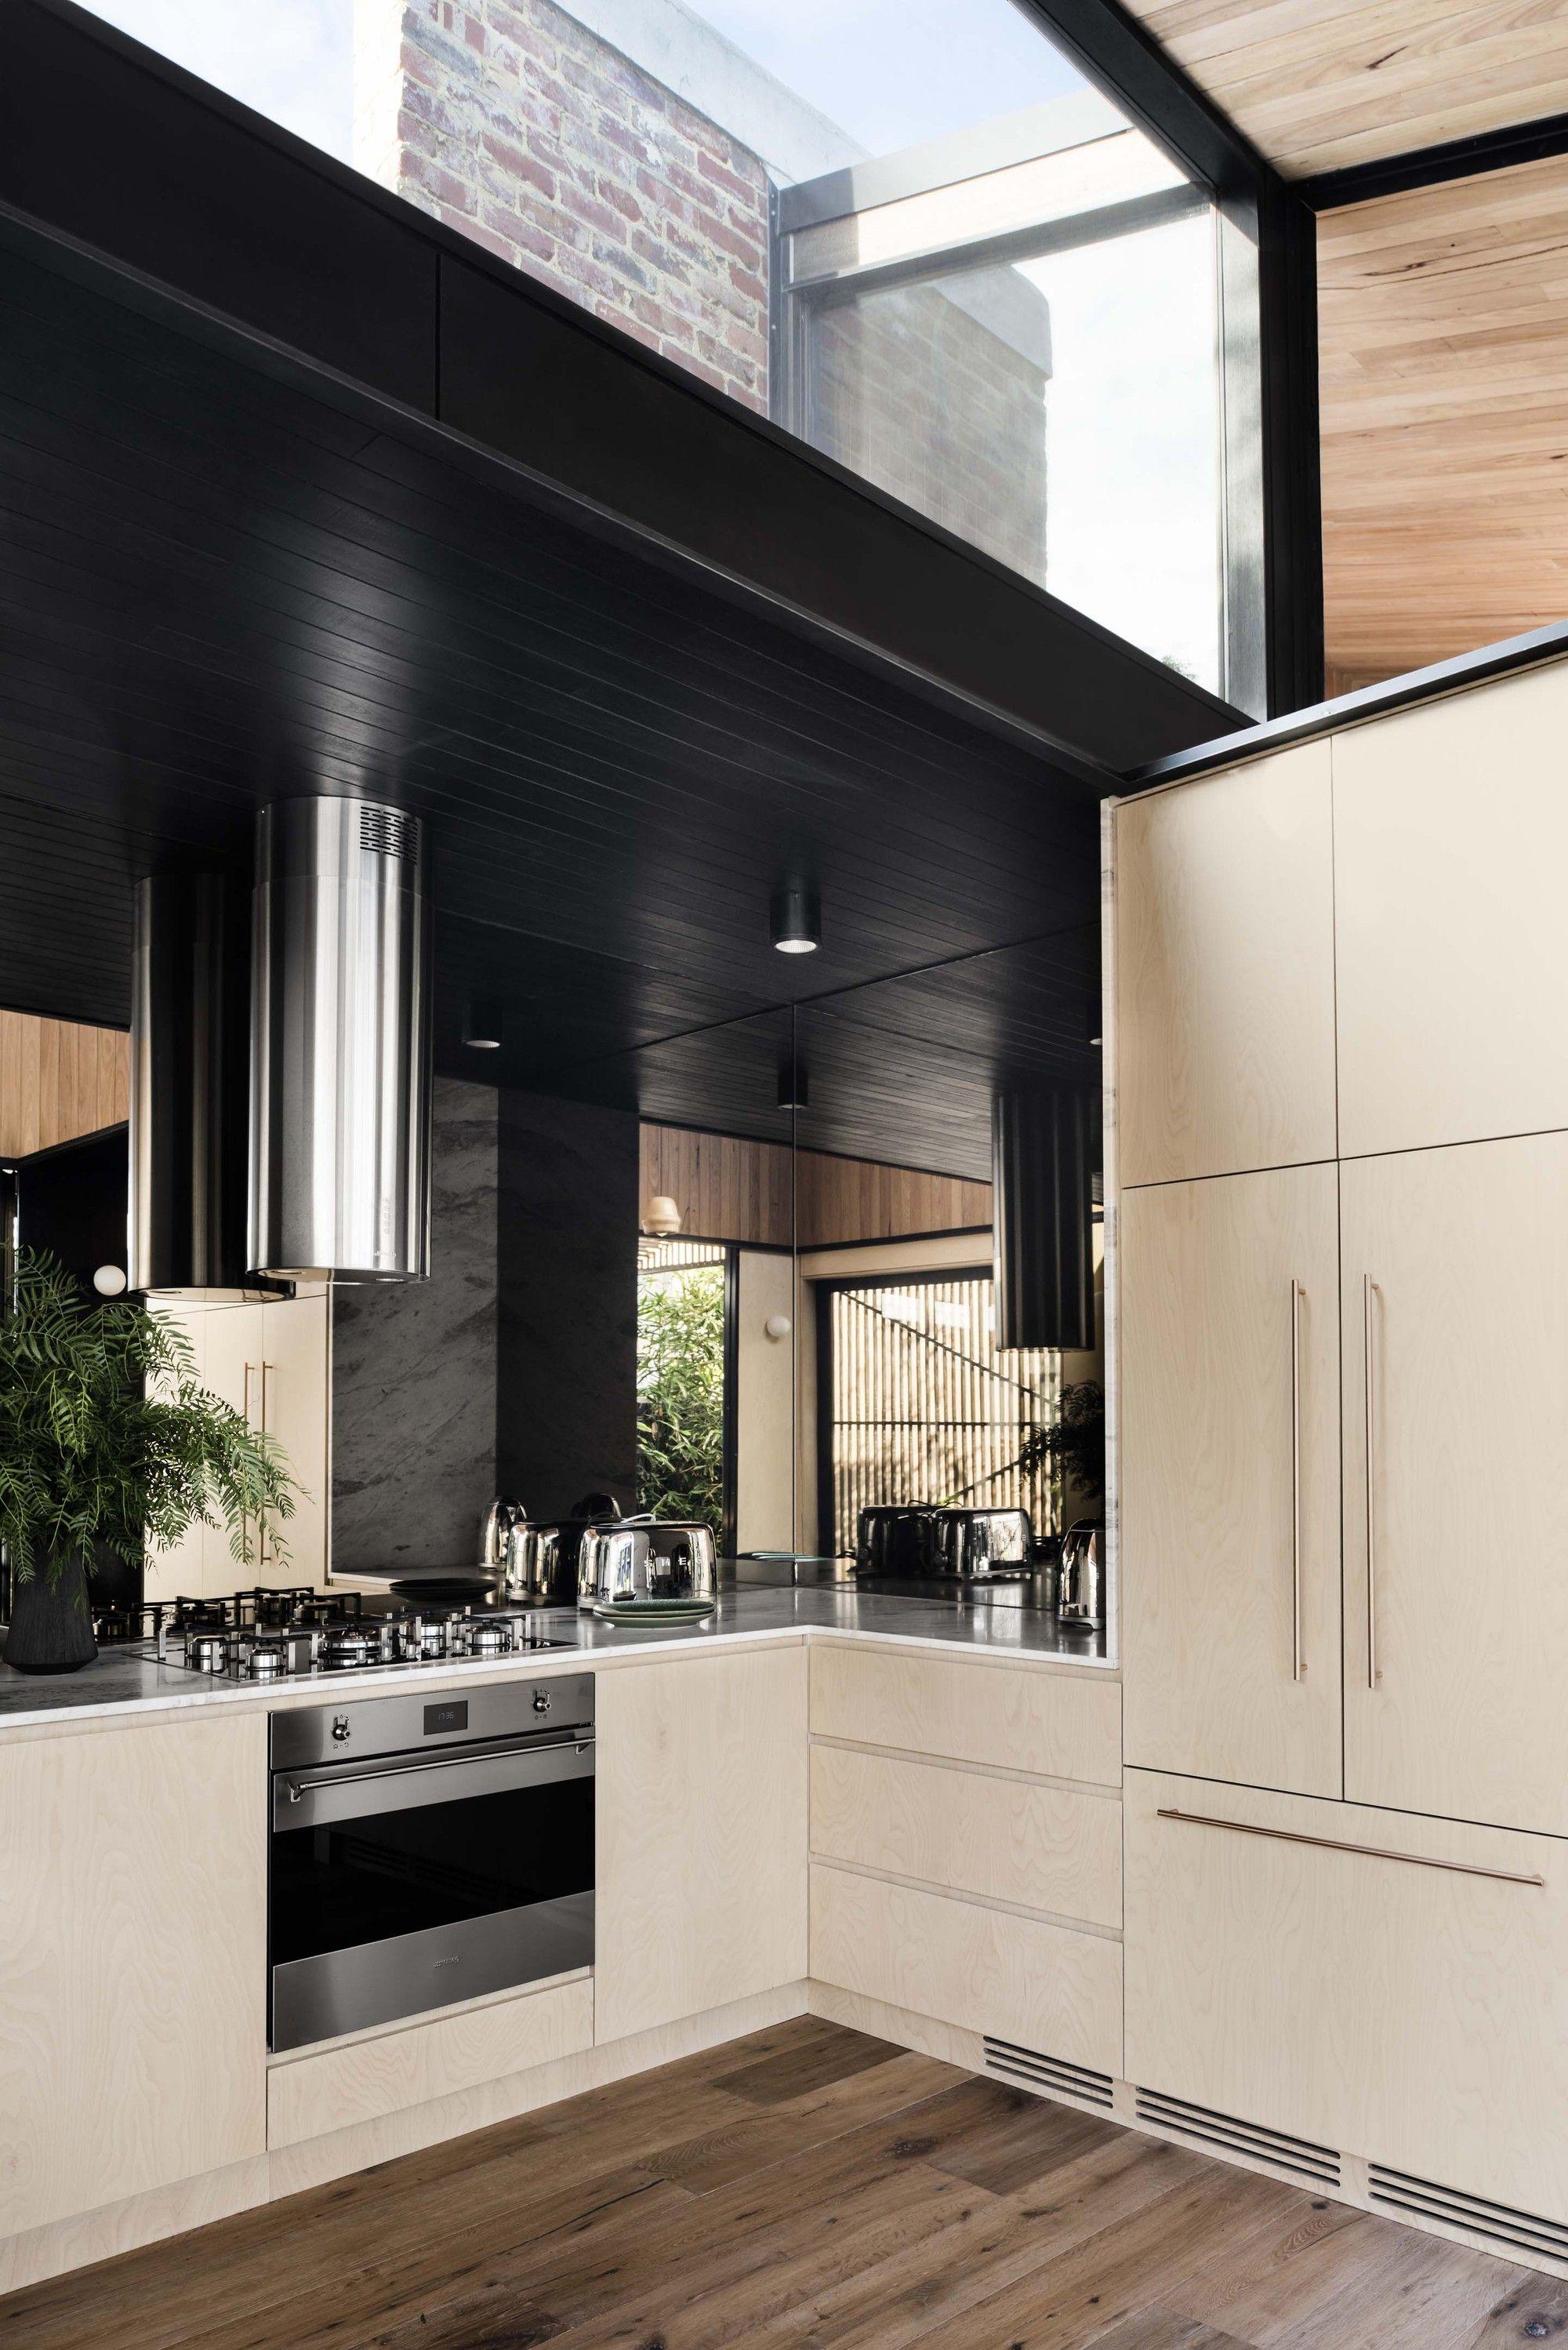 Gallery Of Light Corridor House Figr Architecture Design 11 Kitchen Mirror House Design